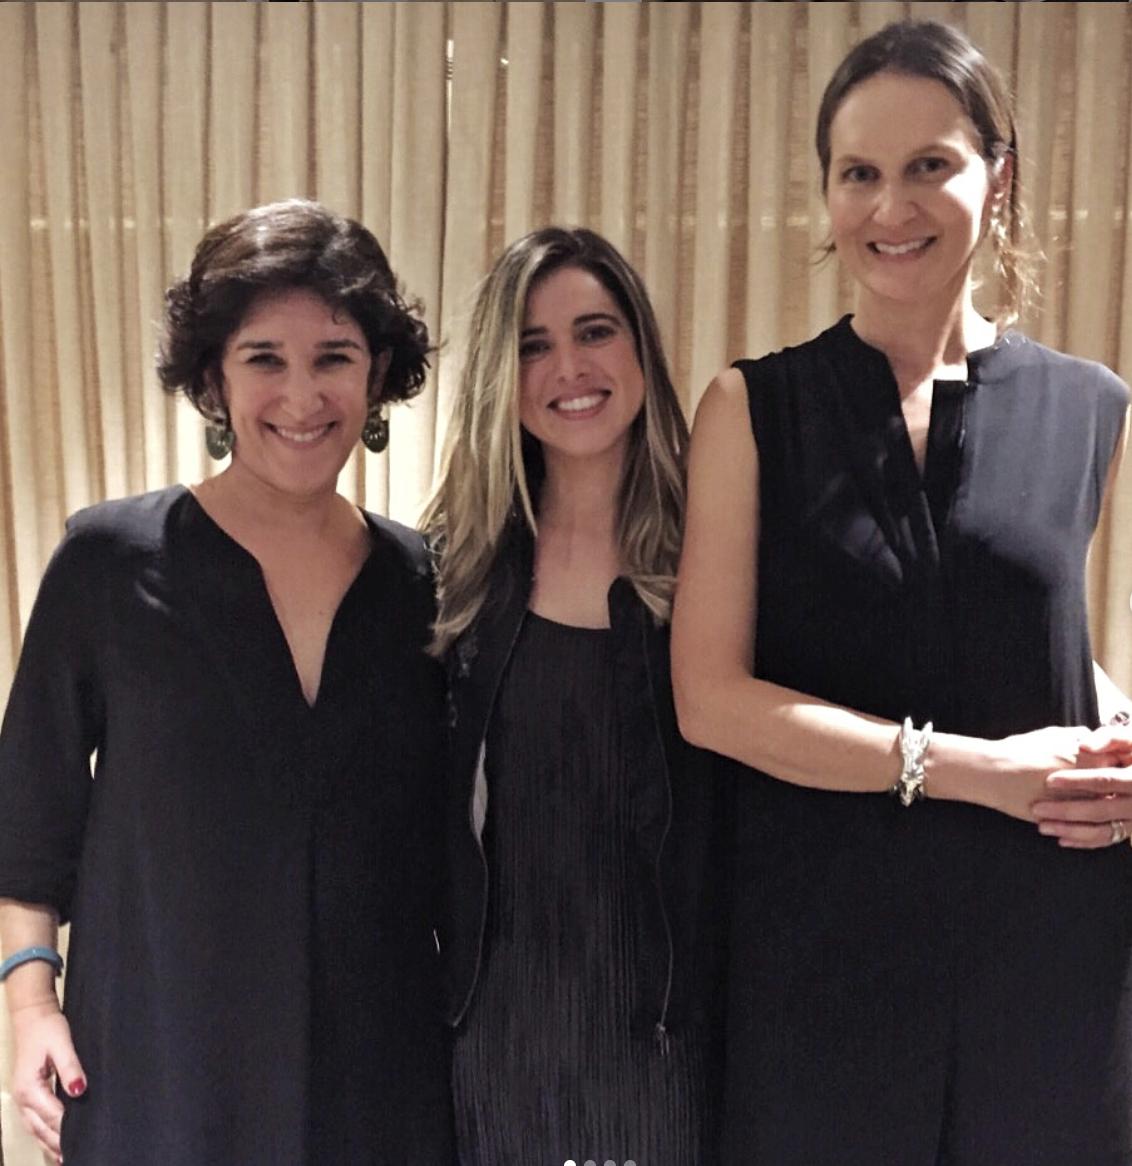 Ilanha Behrenholc, Juliana Berman e Cris Pinheiro